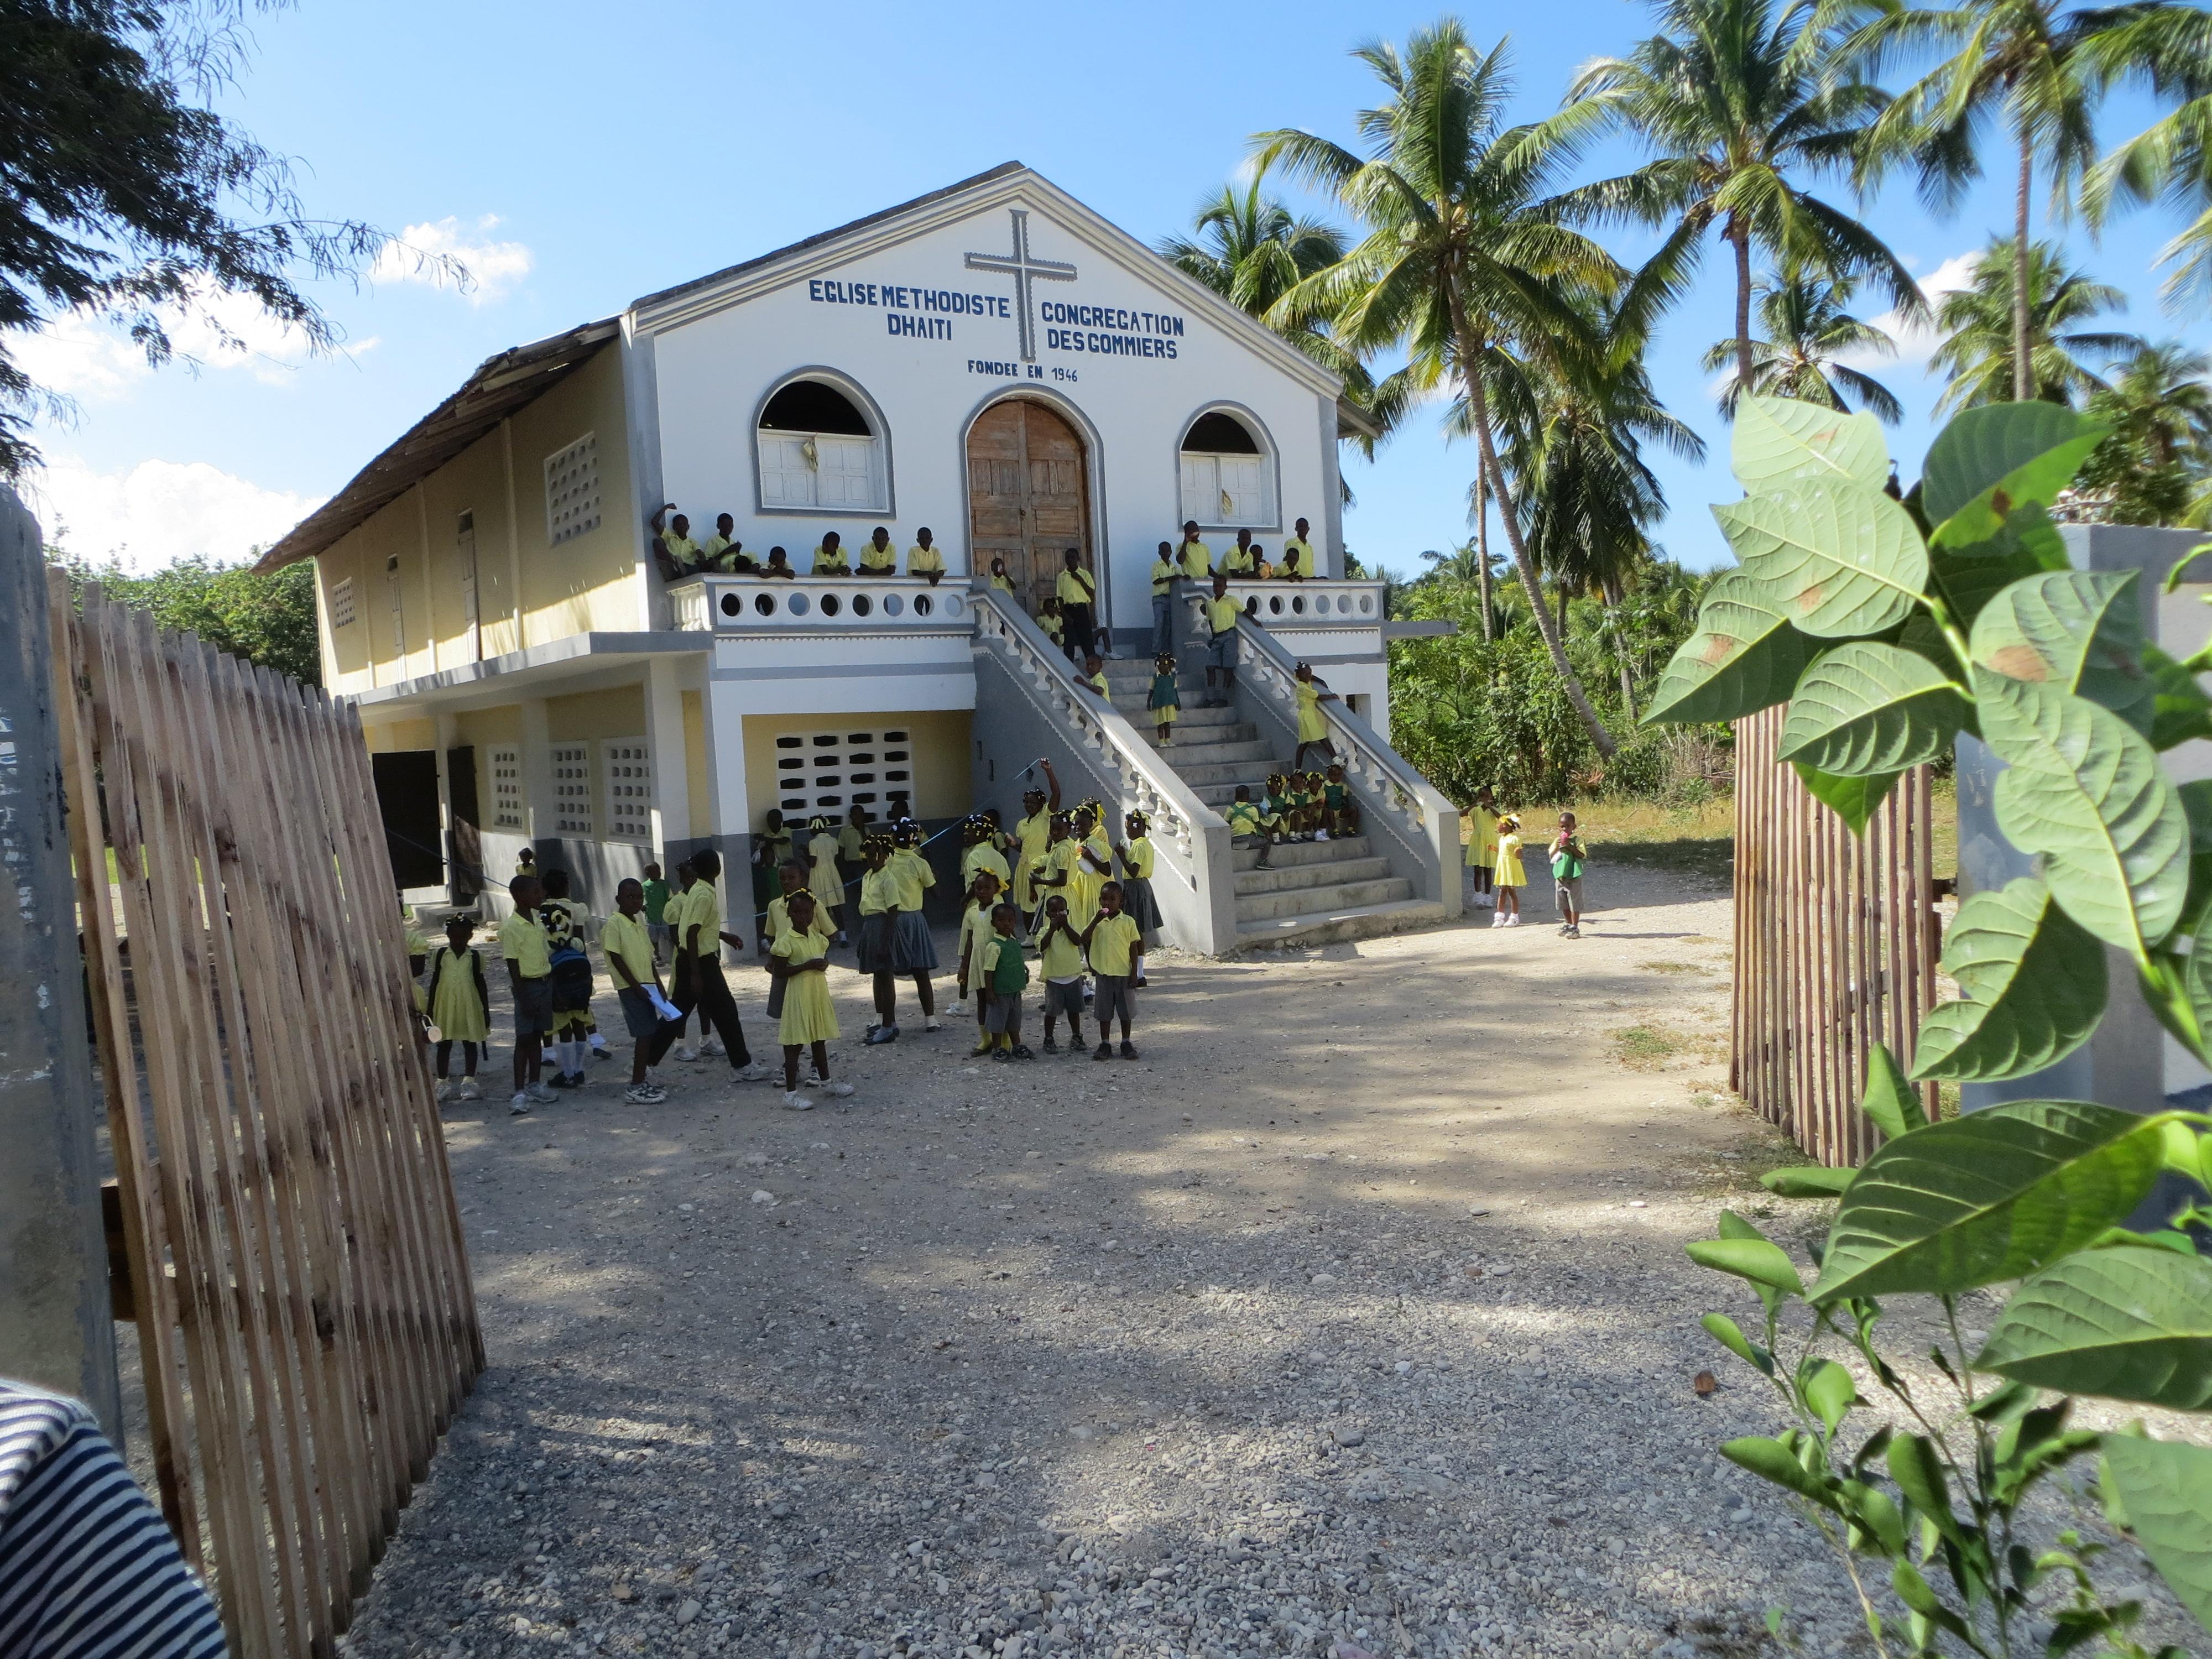 The School and children